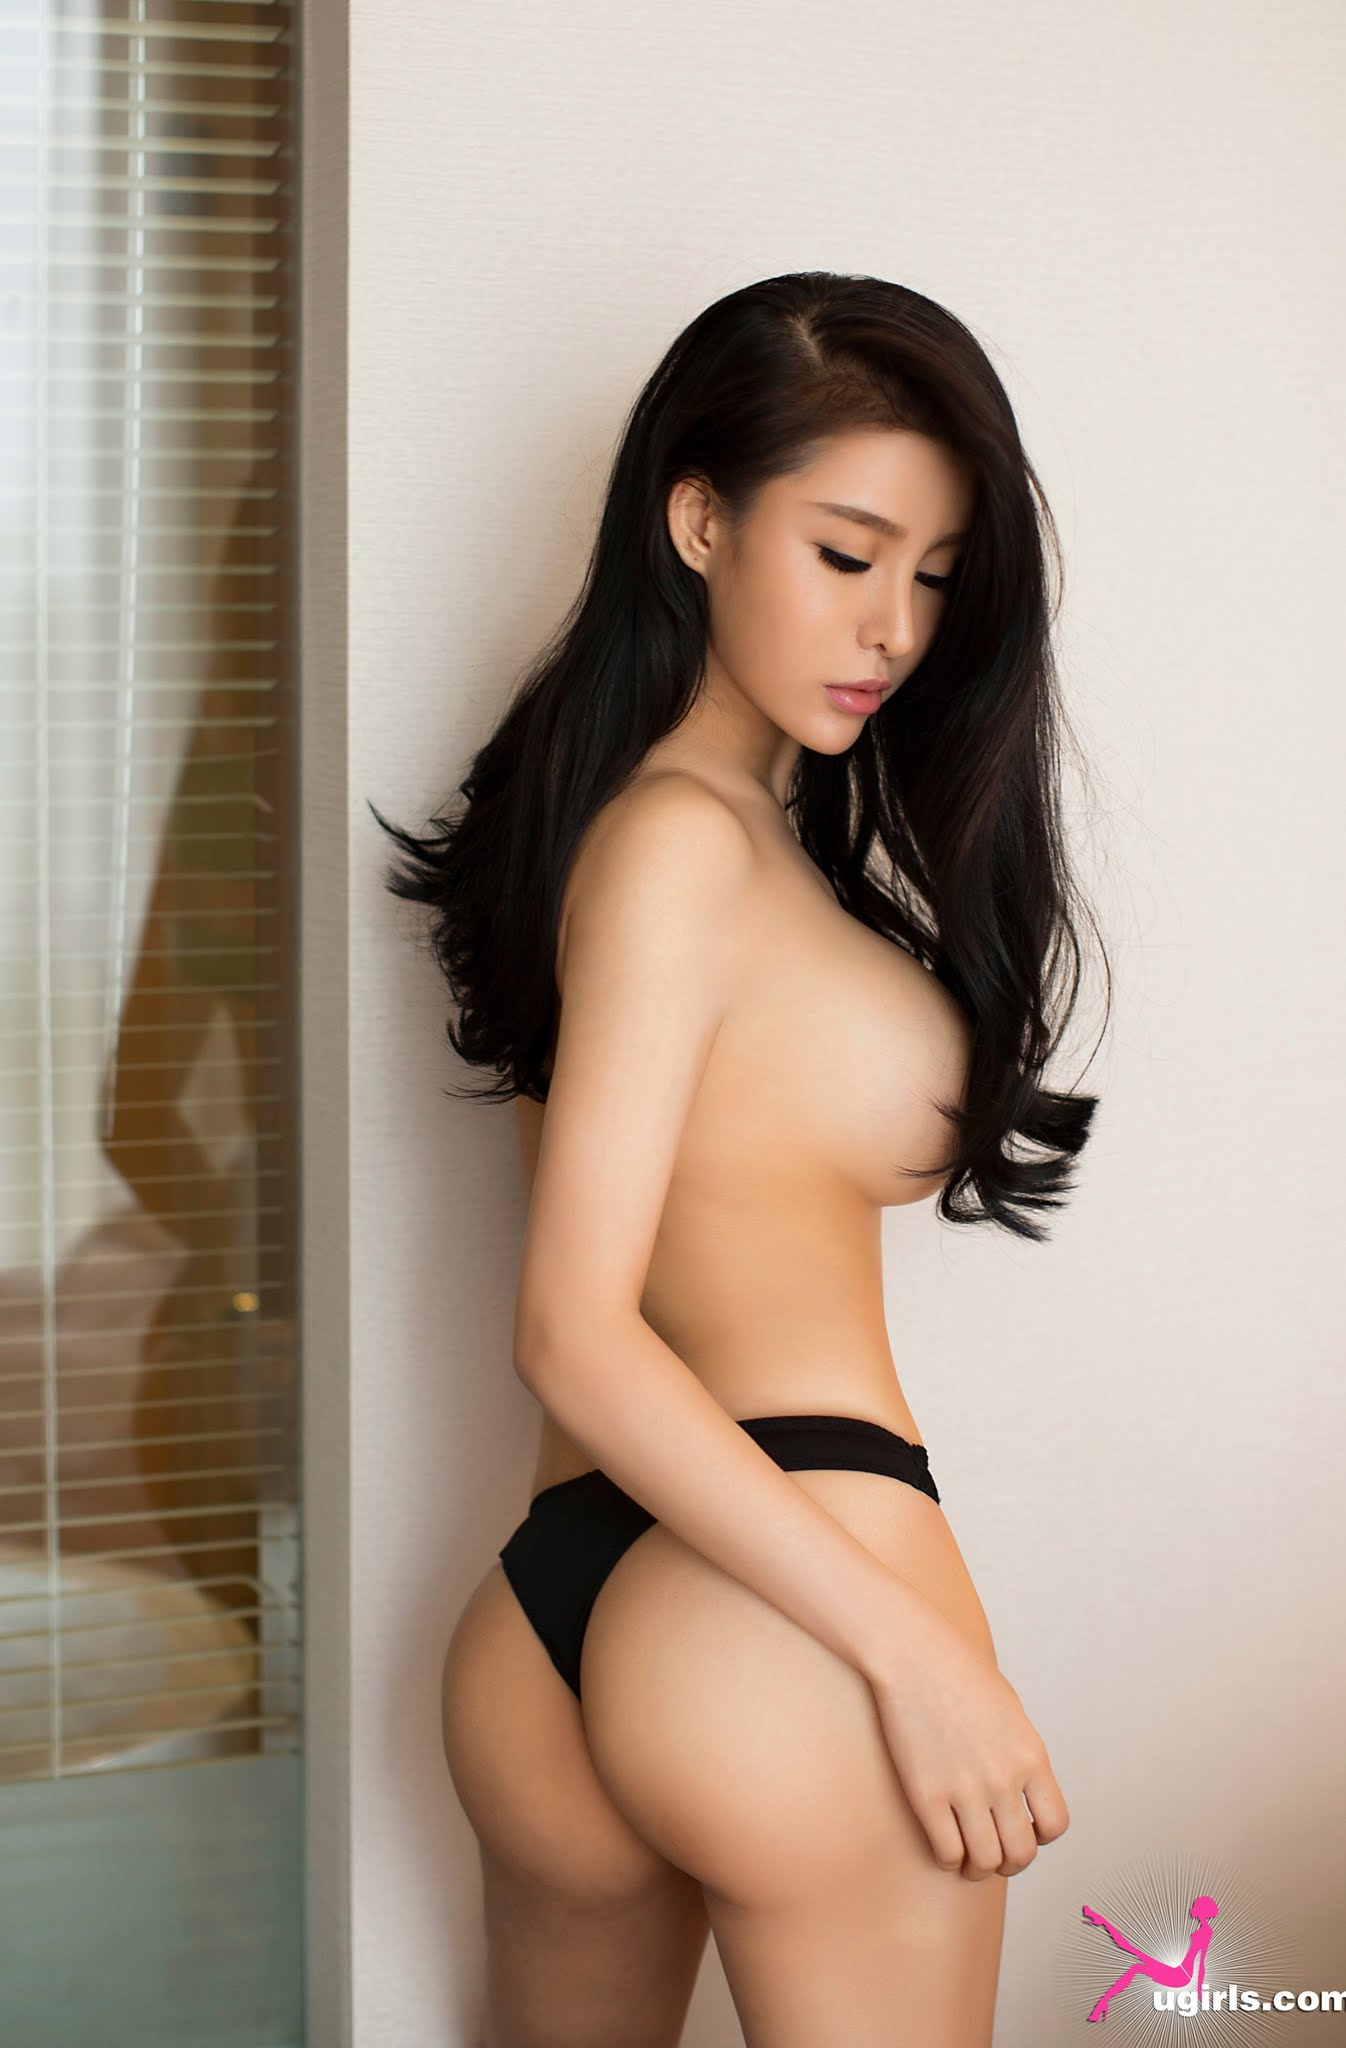 Hot kiss sexy girl-7545